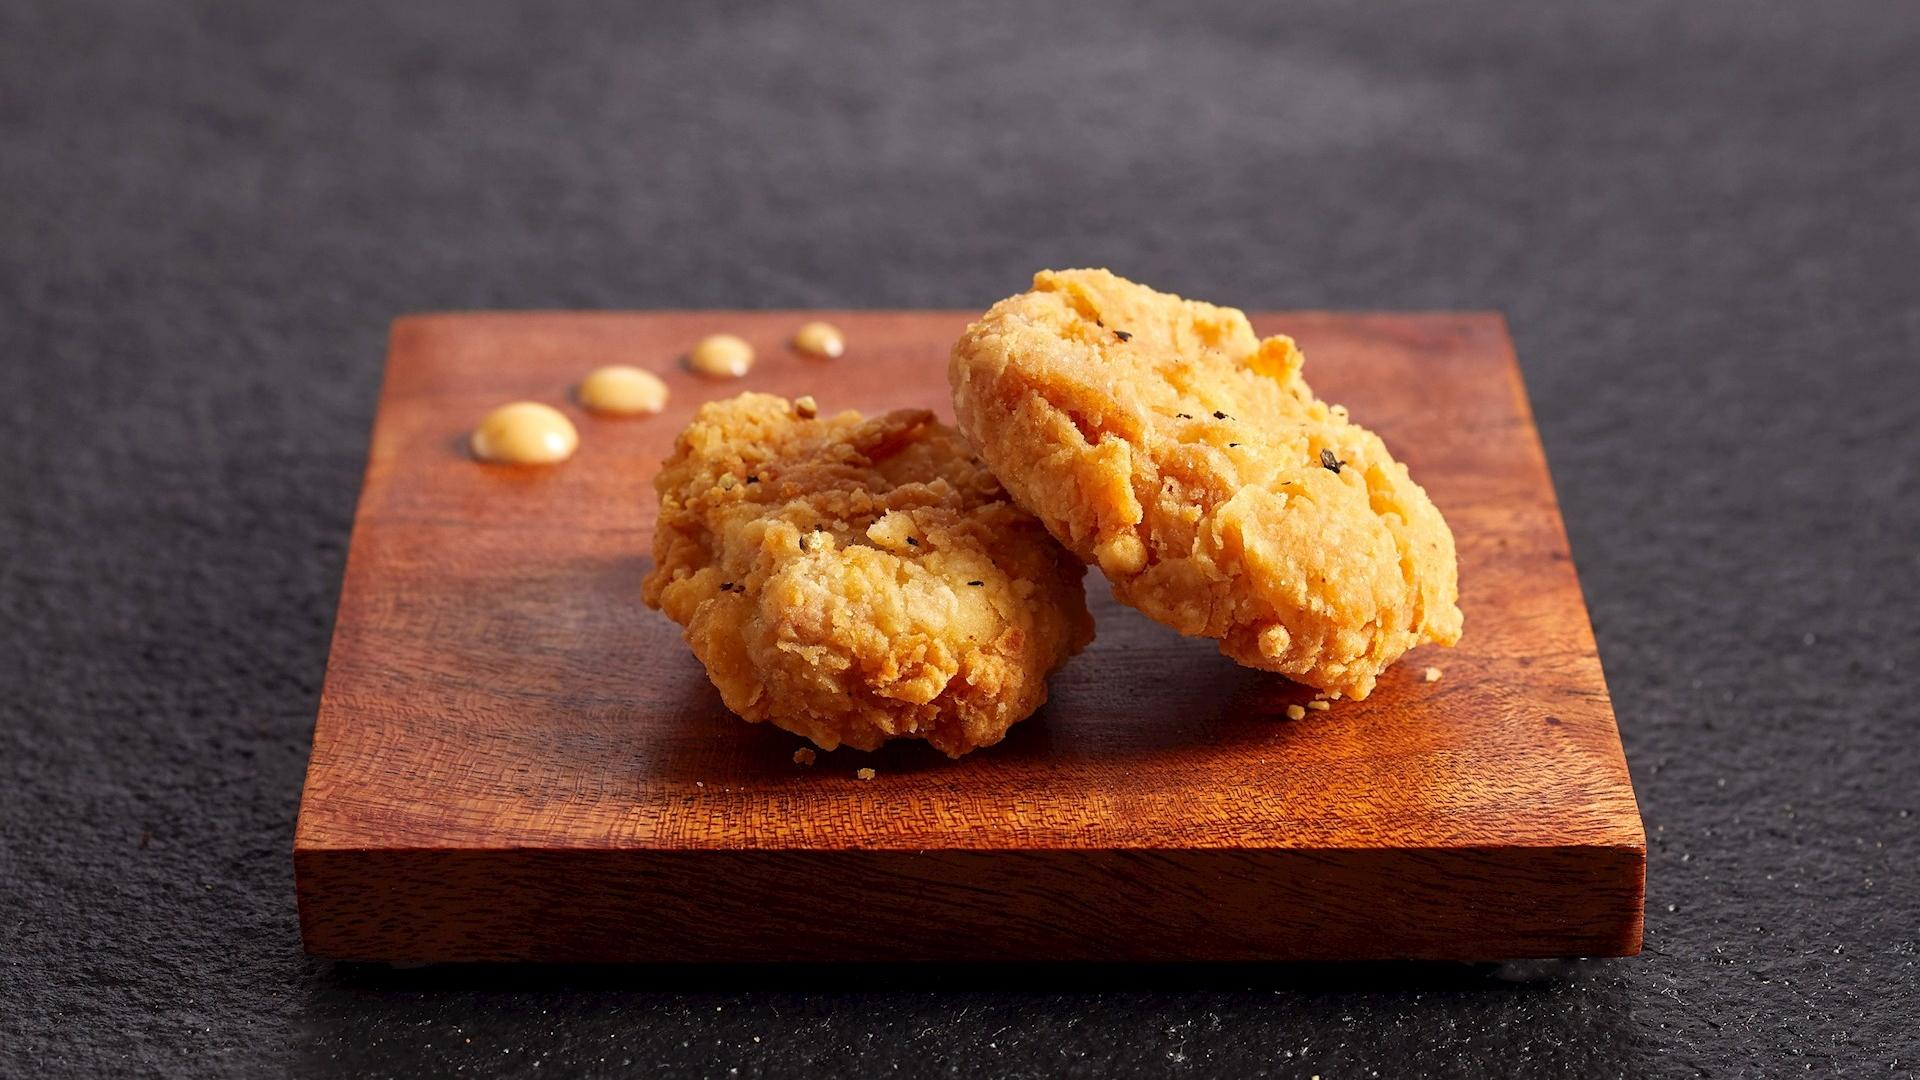 Singapur autoriza venta de carne de pollo artificial, una primicia mundial